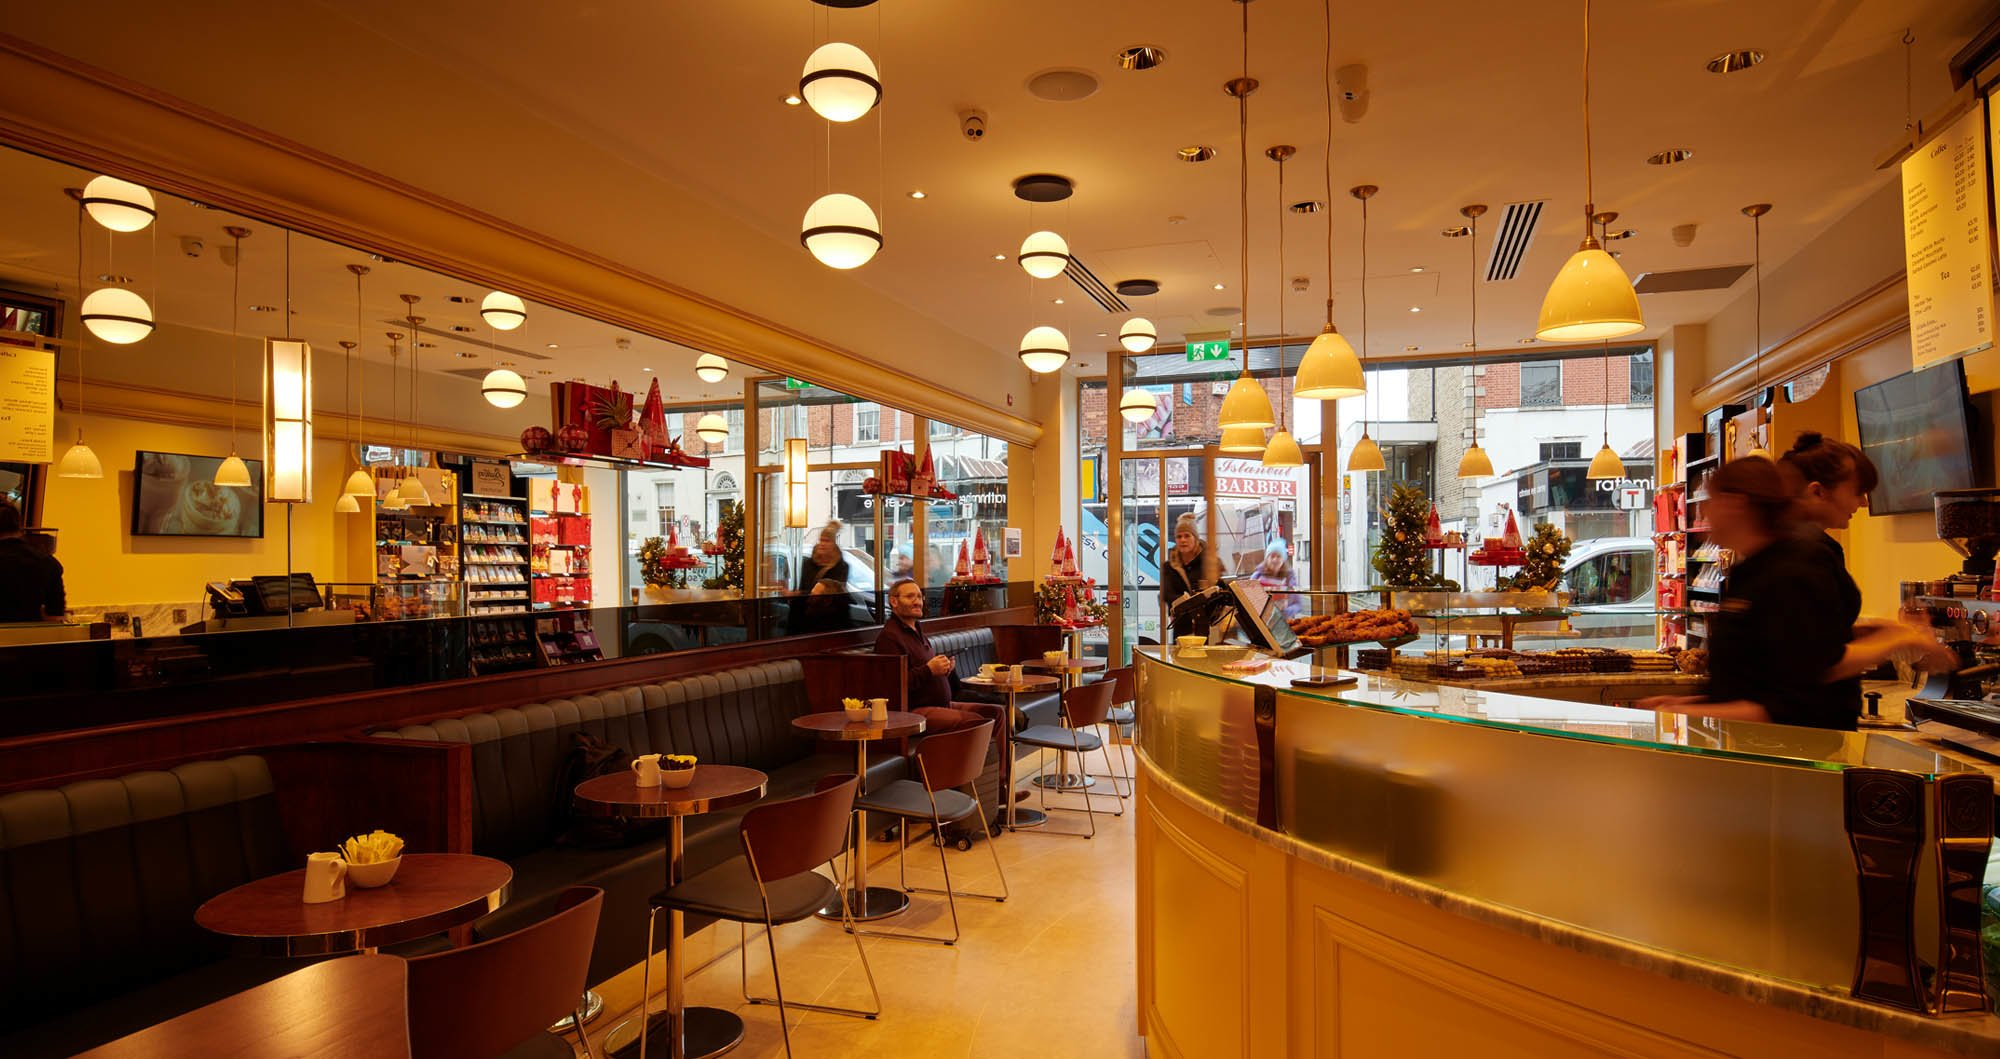 Butlers Chocolate Café, Rathmines